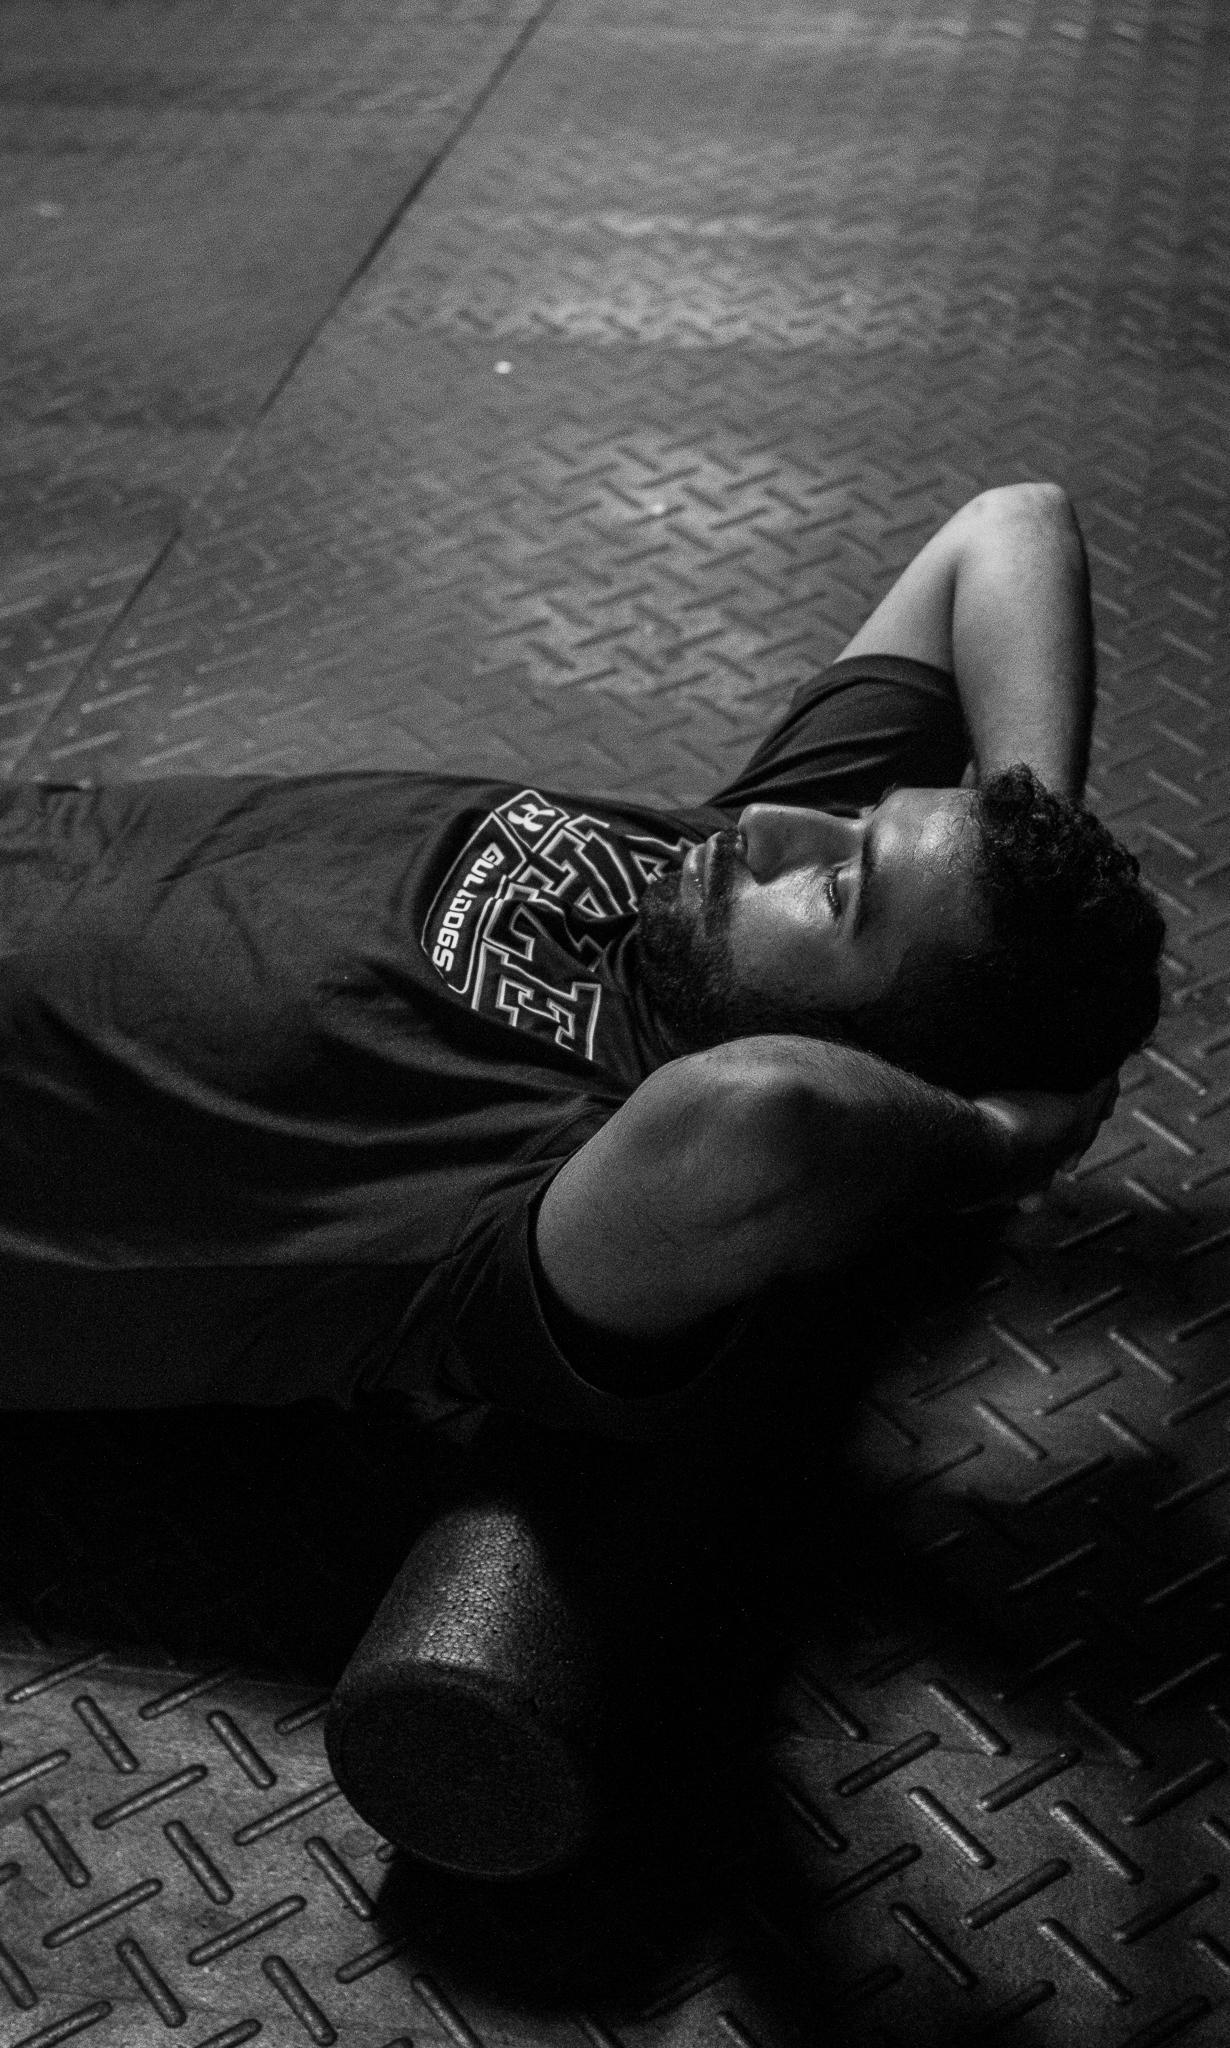 james-wright-visit-brooklyn-new-york-weightlifting-coach-teammates-october-2016 (41 of 92).jpg